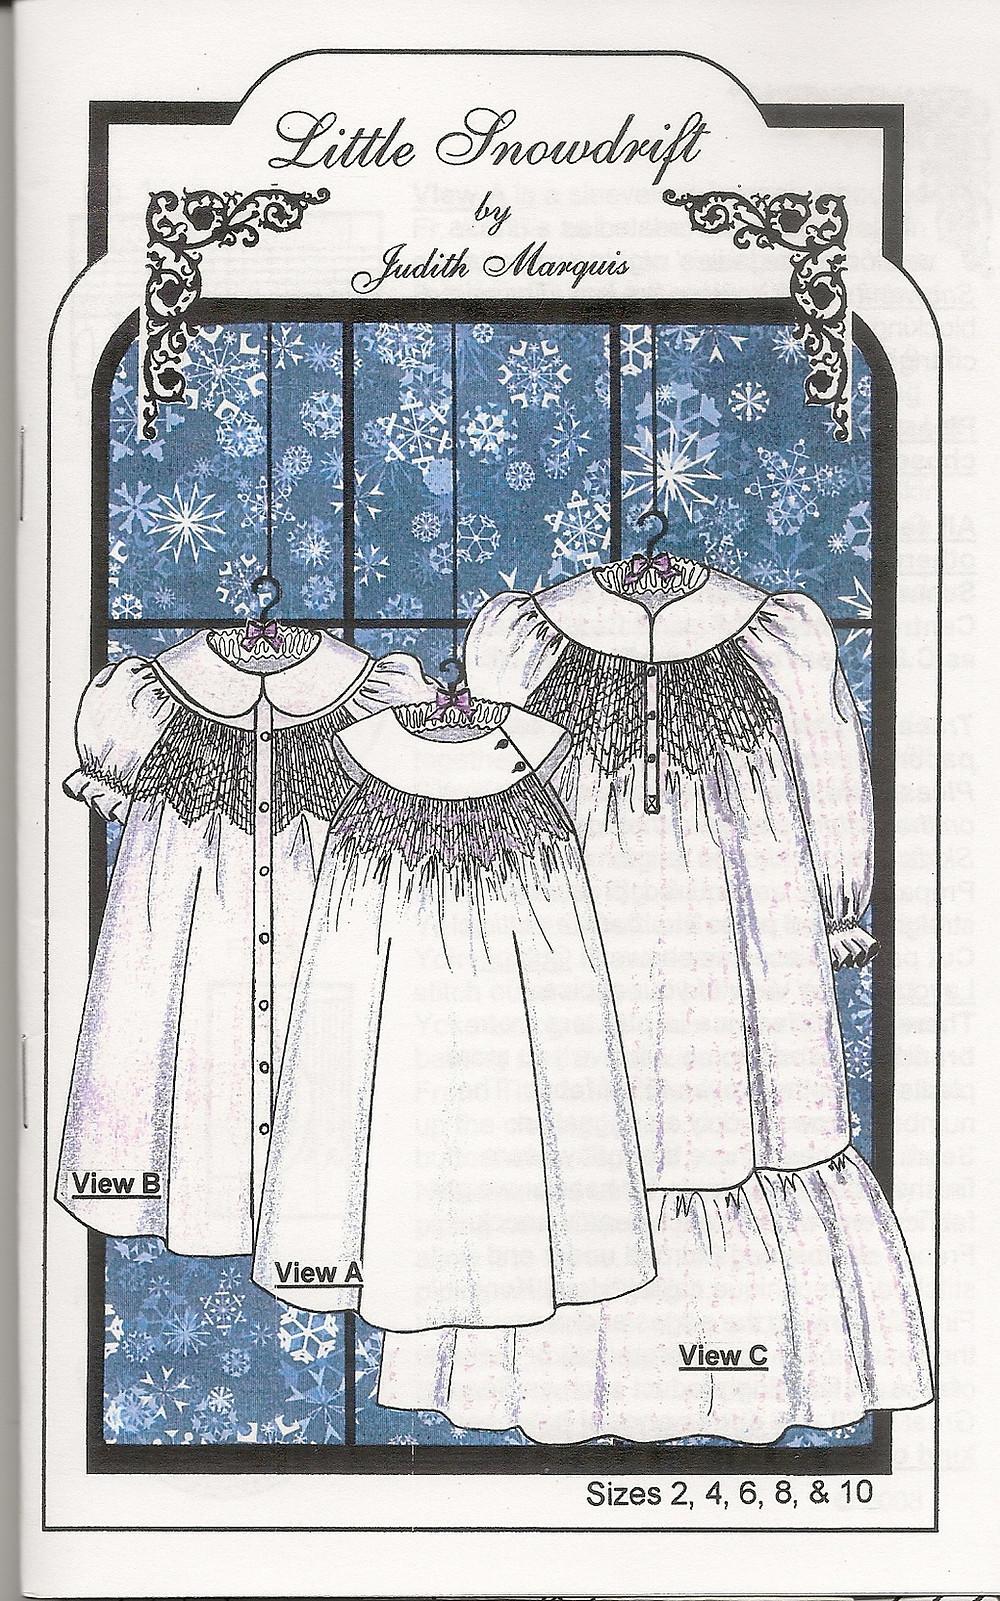 Little Snowdrift Nightgown Pattern